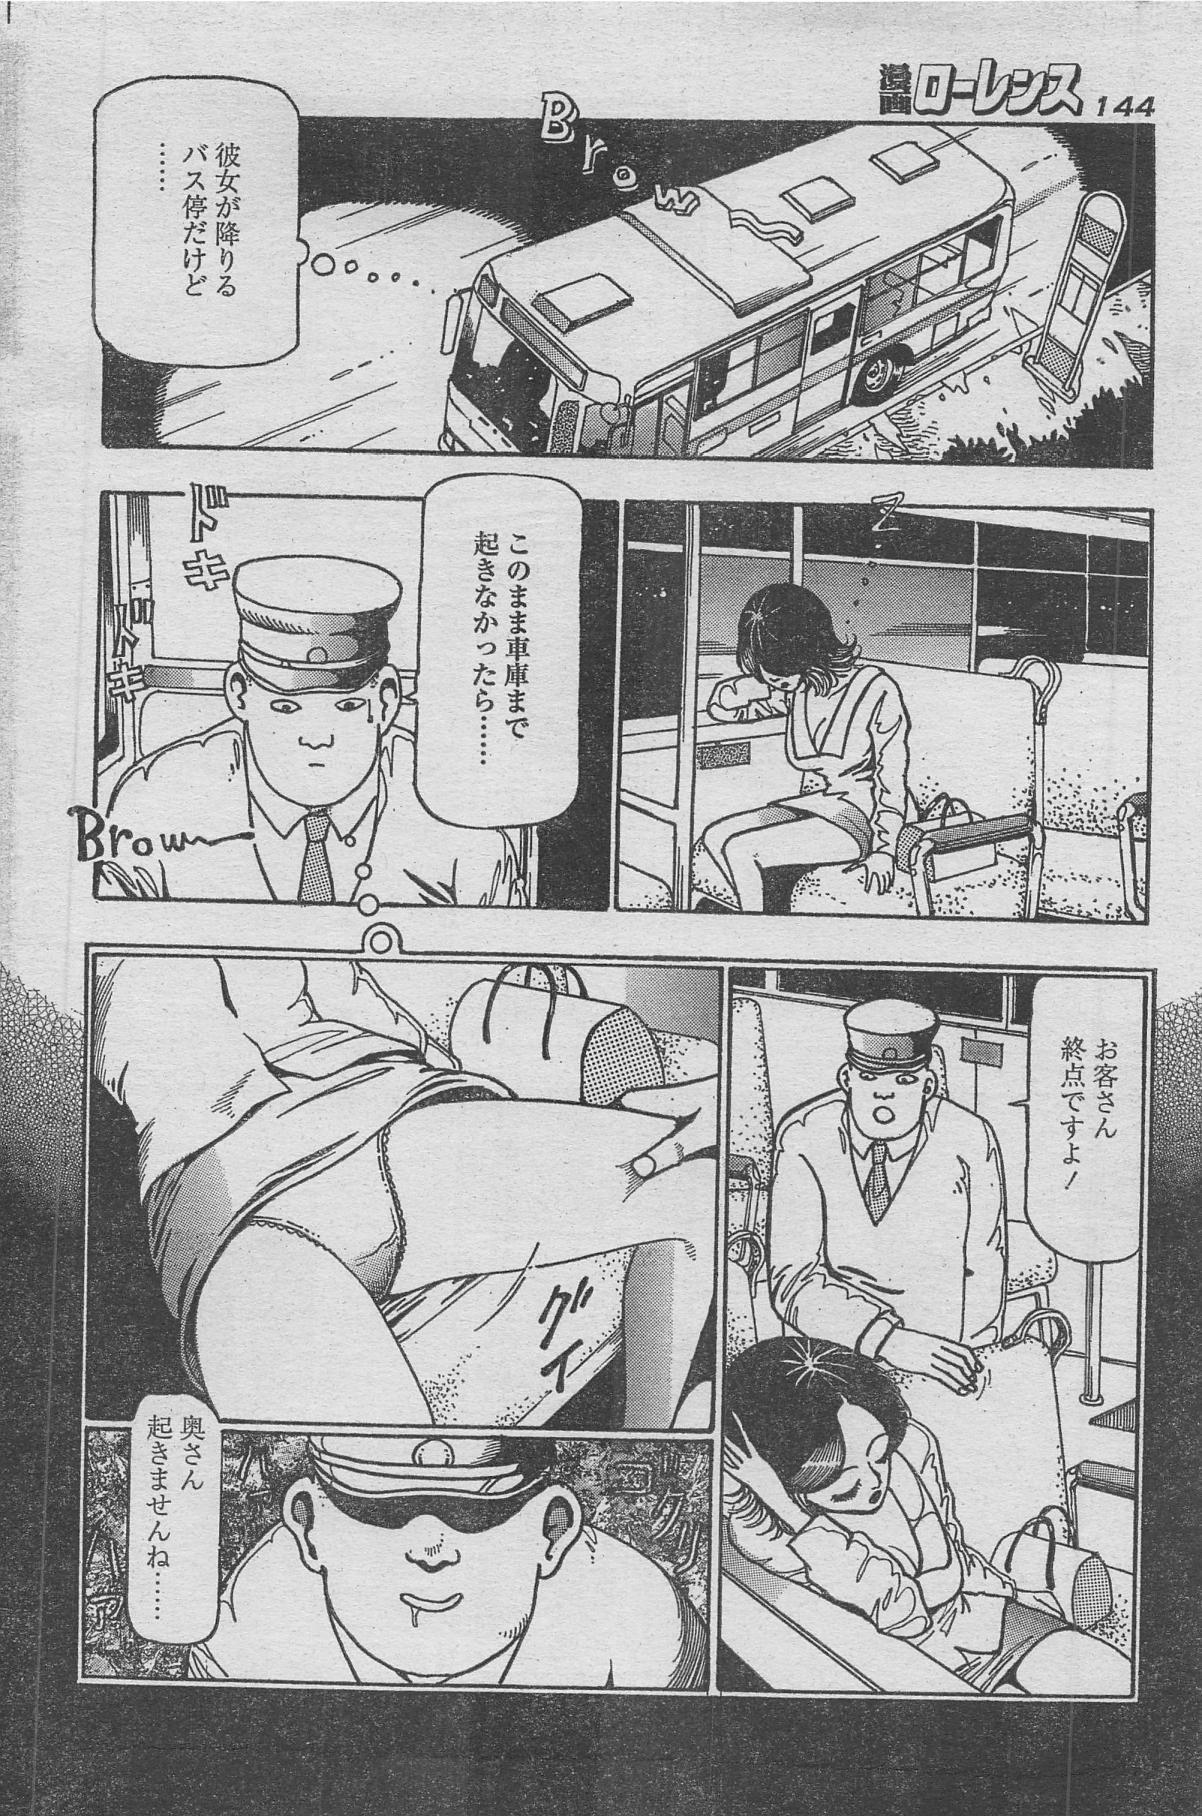 Manga Lawrence 2013-04 131